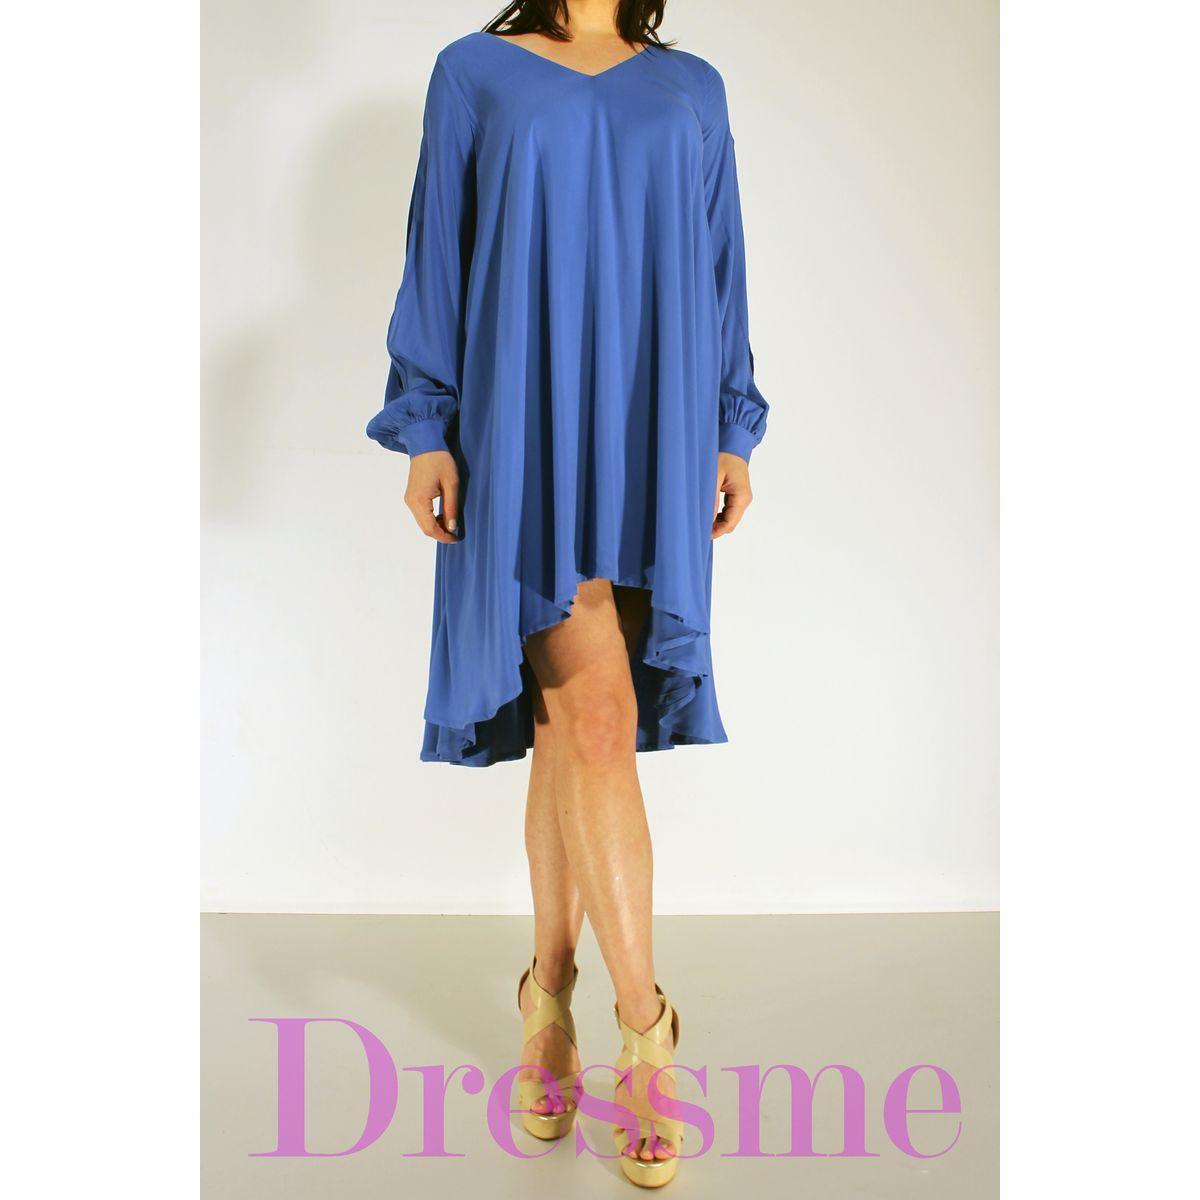 ab10beaa66d4 Φόρεμα κοντό μπροστά μακρύ πίσω - Dressme